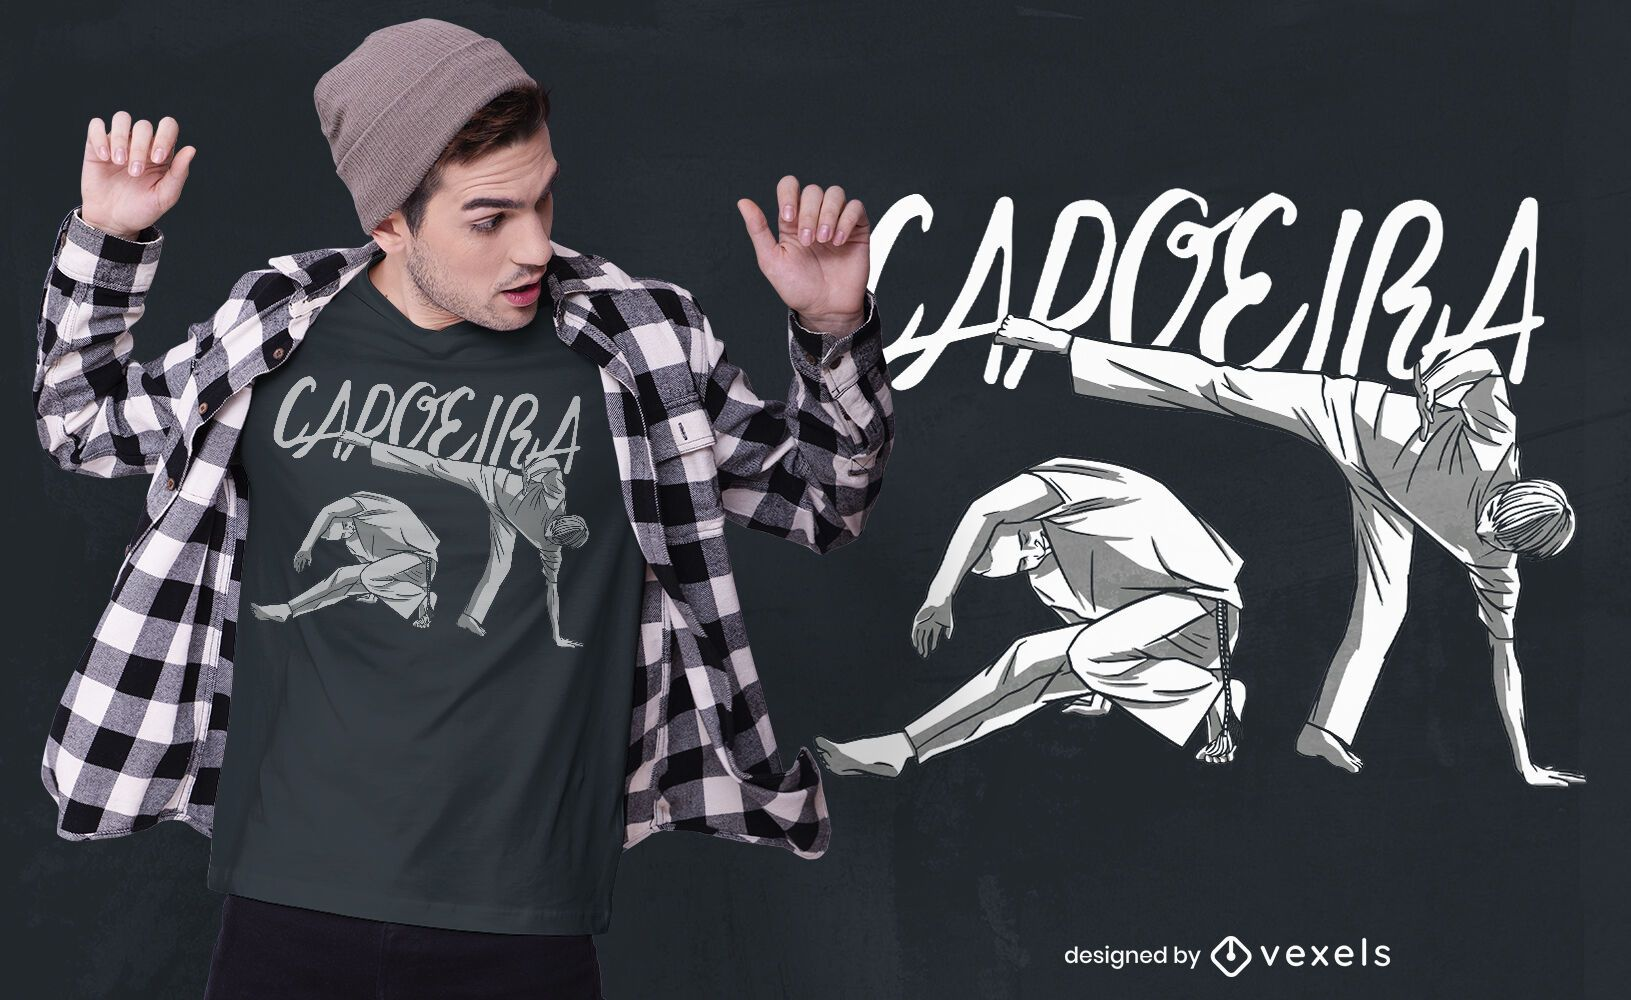 Capoeira dancing quote t-shirt design